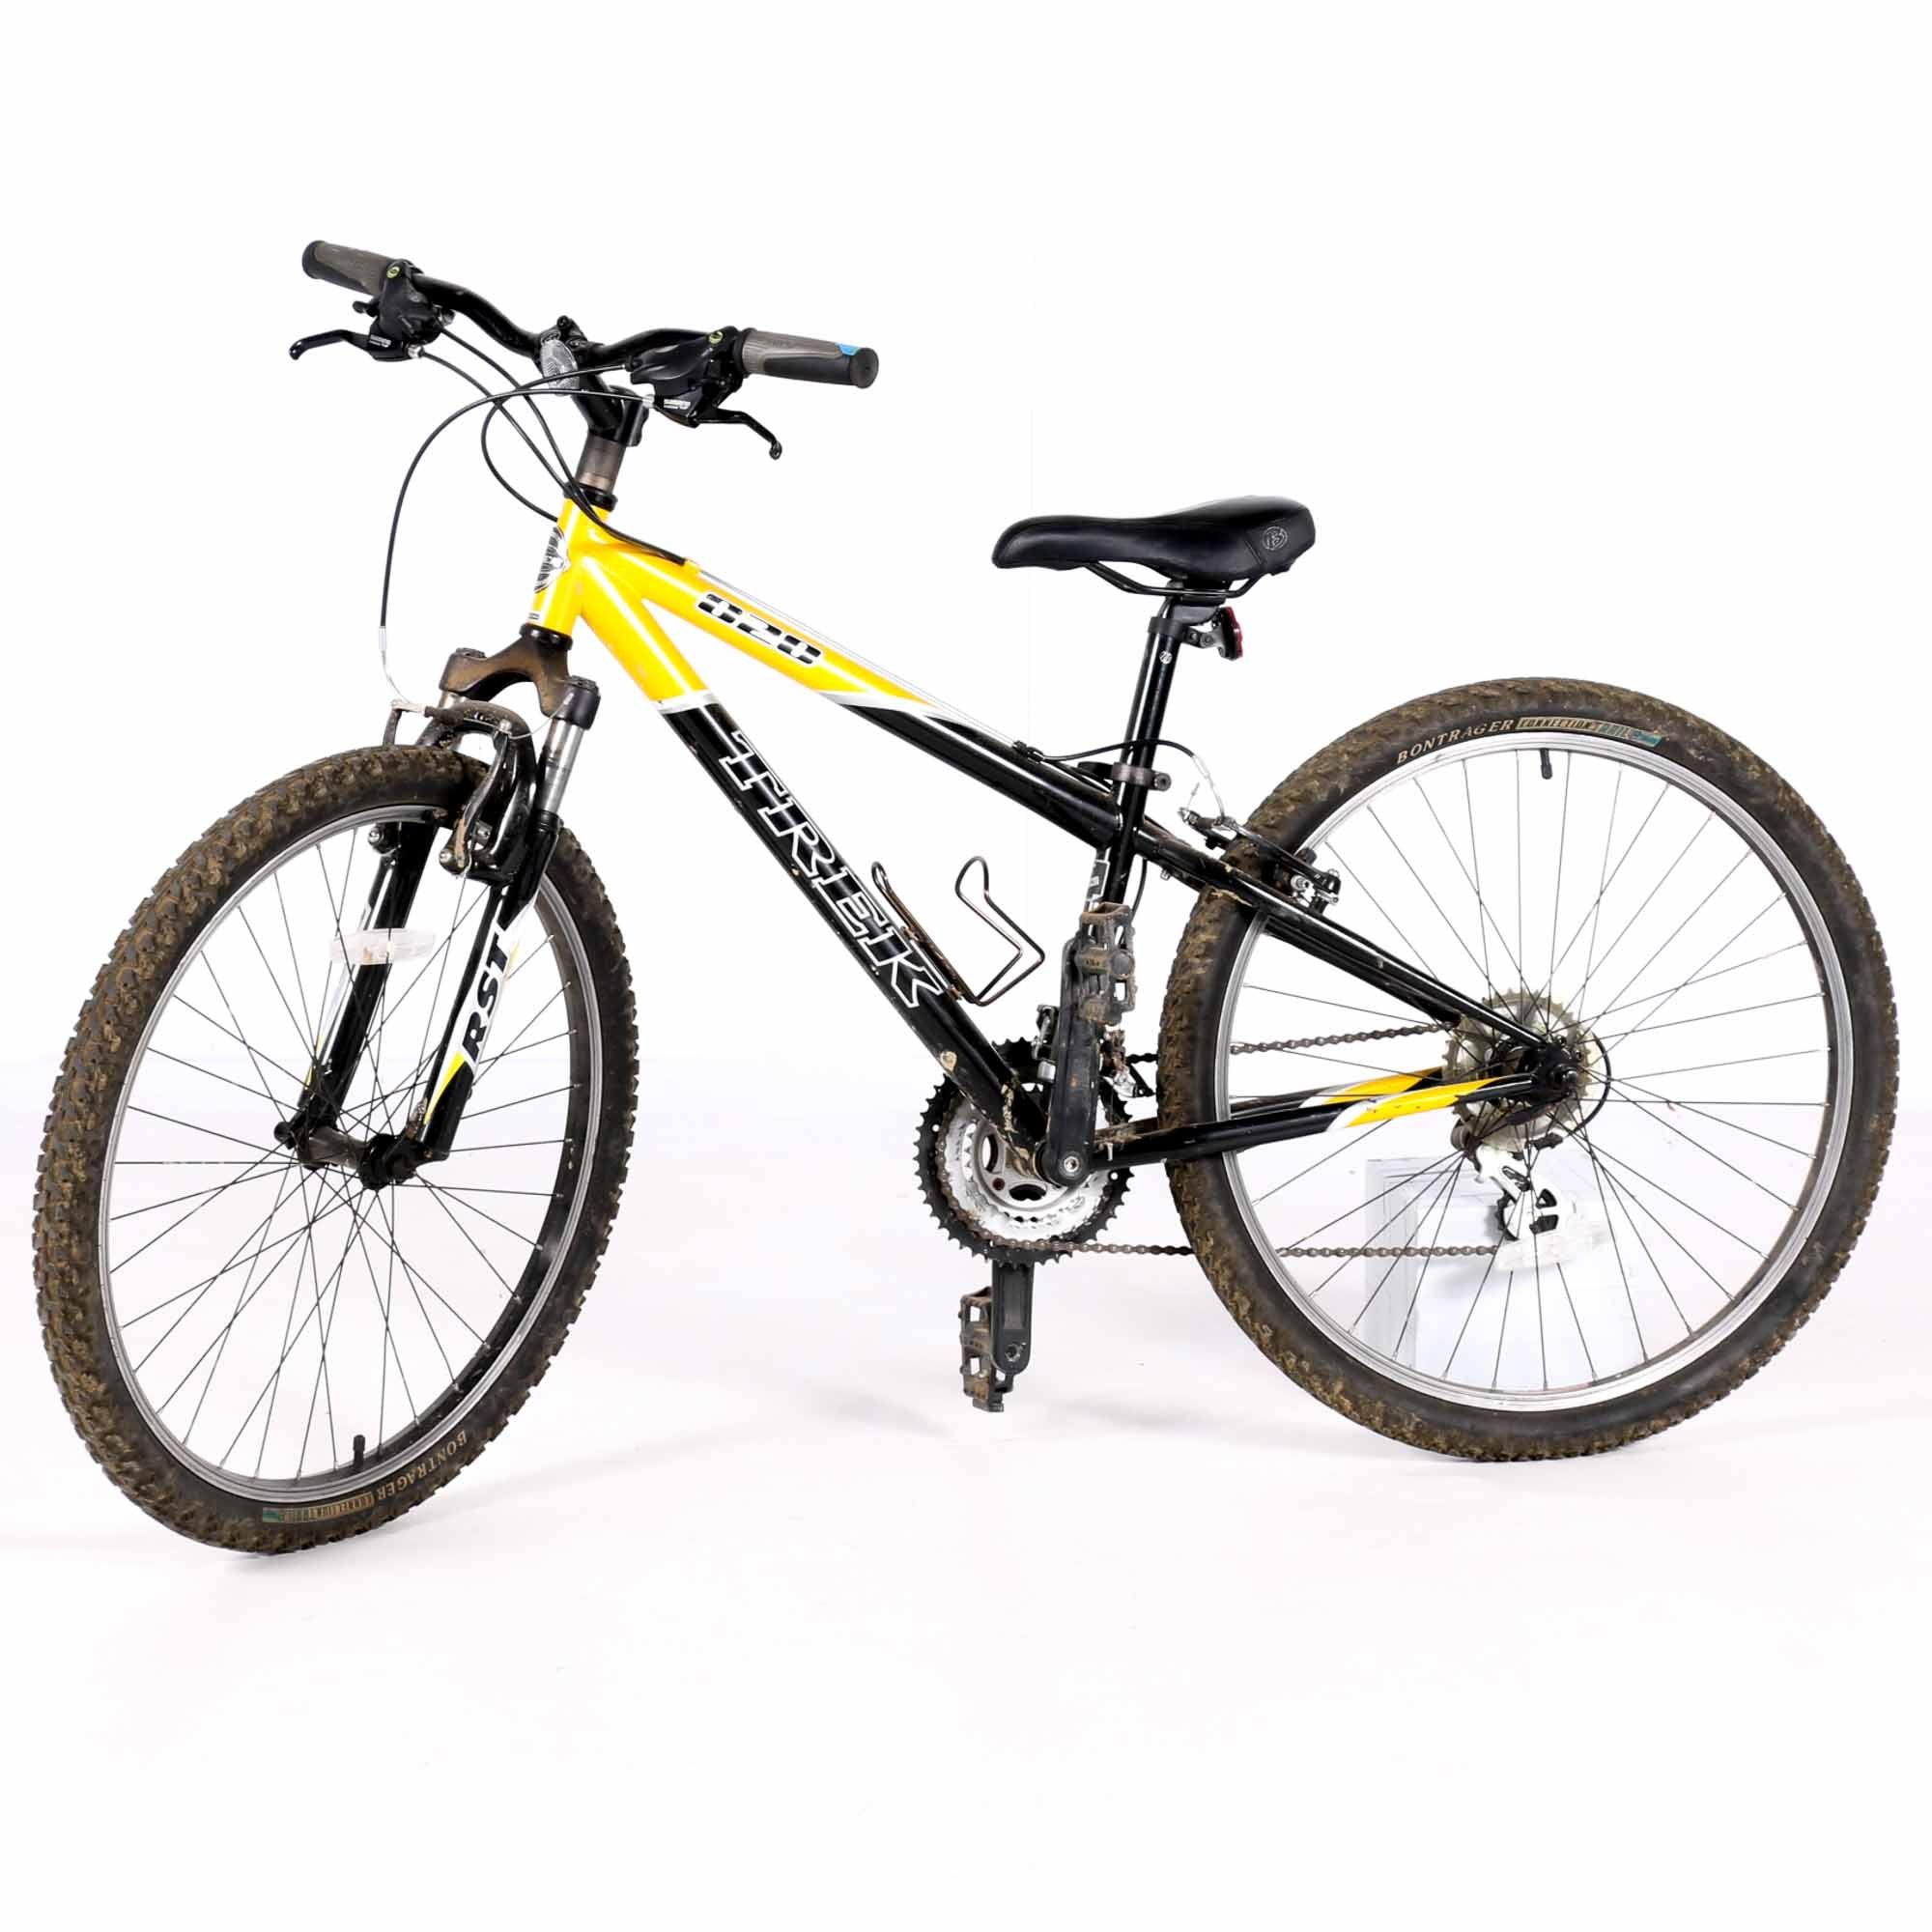 TREK 820 Single Track Series Mountain Bike